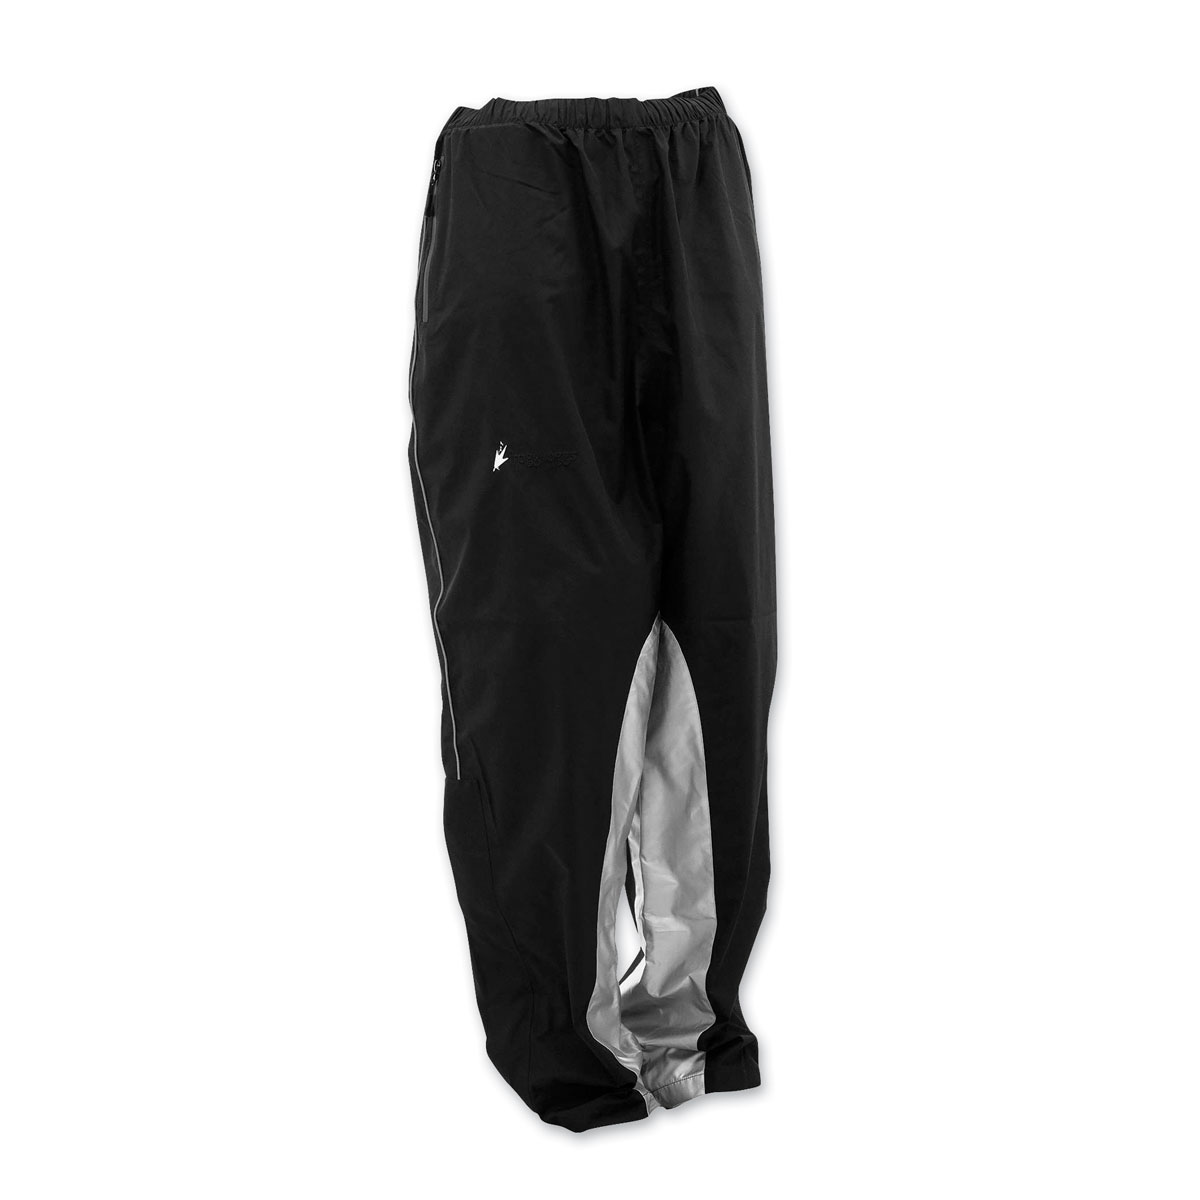 Frogg Toggs Women's Java Black Rain Pants